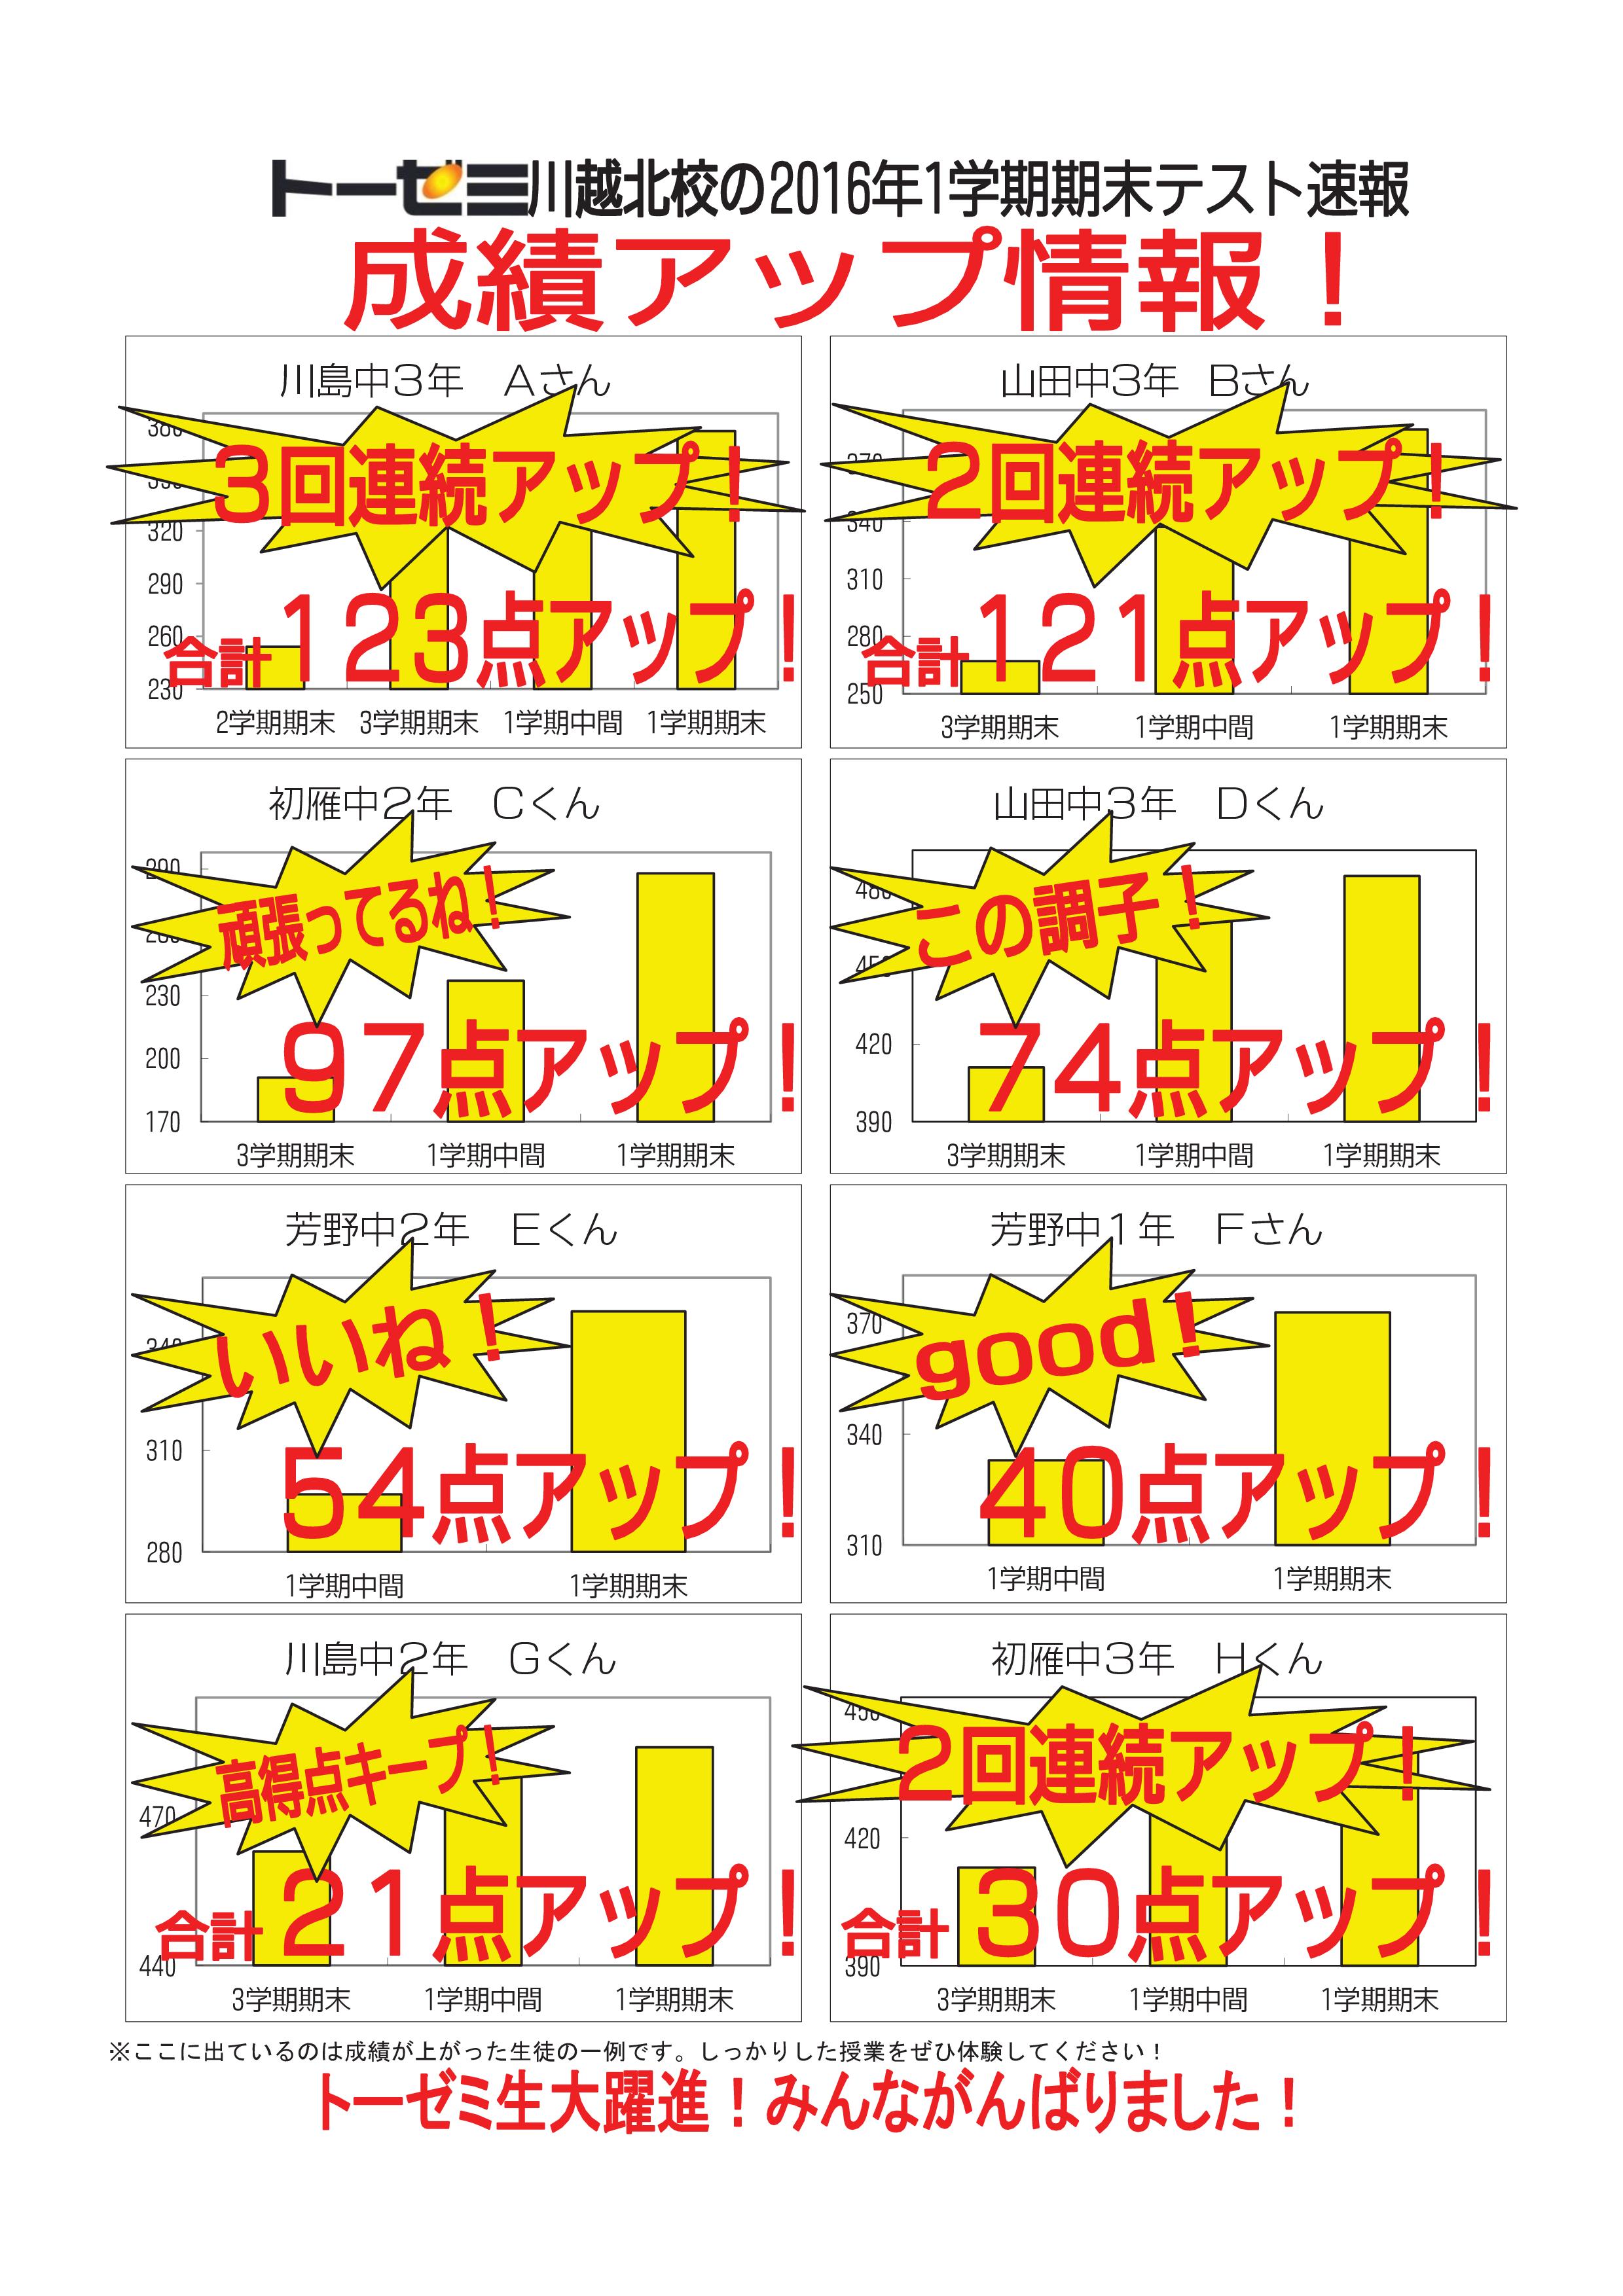 【川越市神明町の学習塾 トーゼミ】2016一学期期末-001